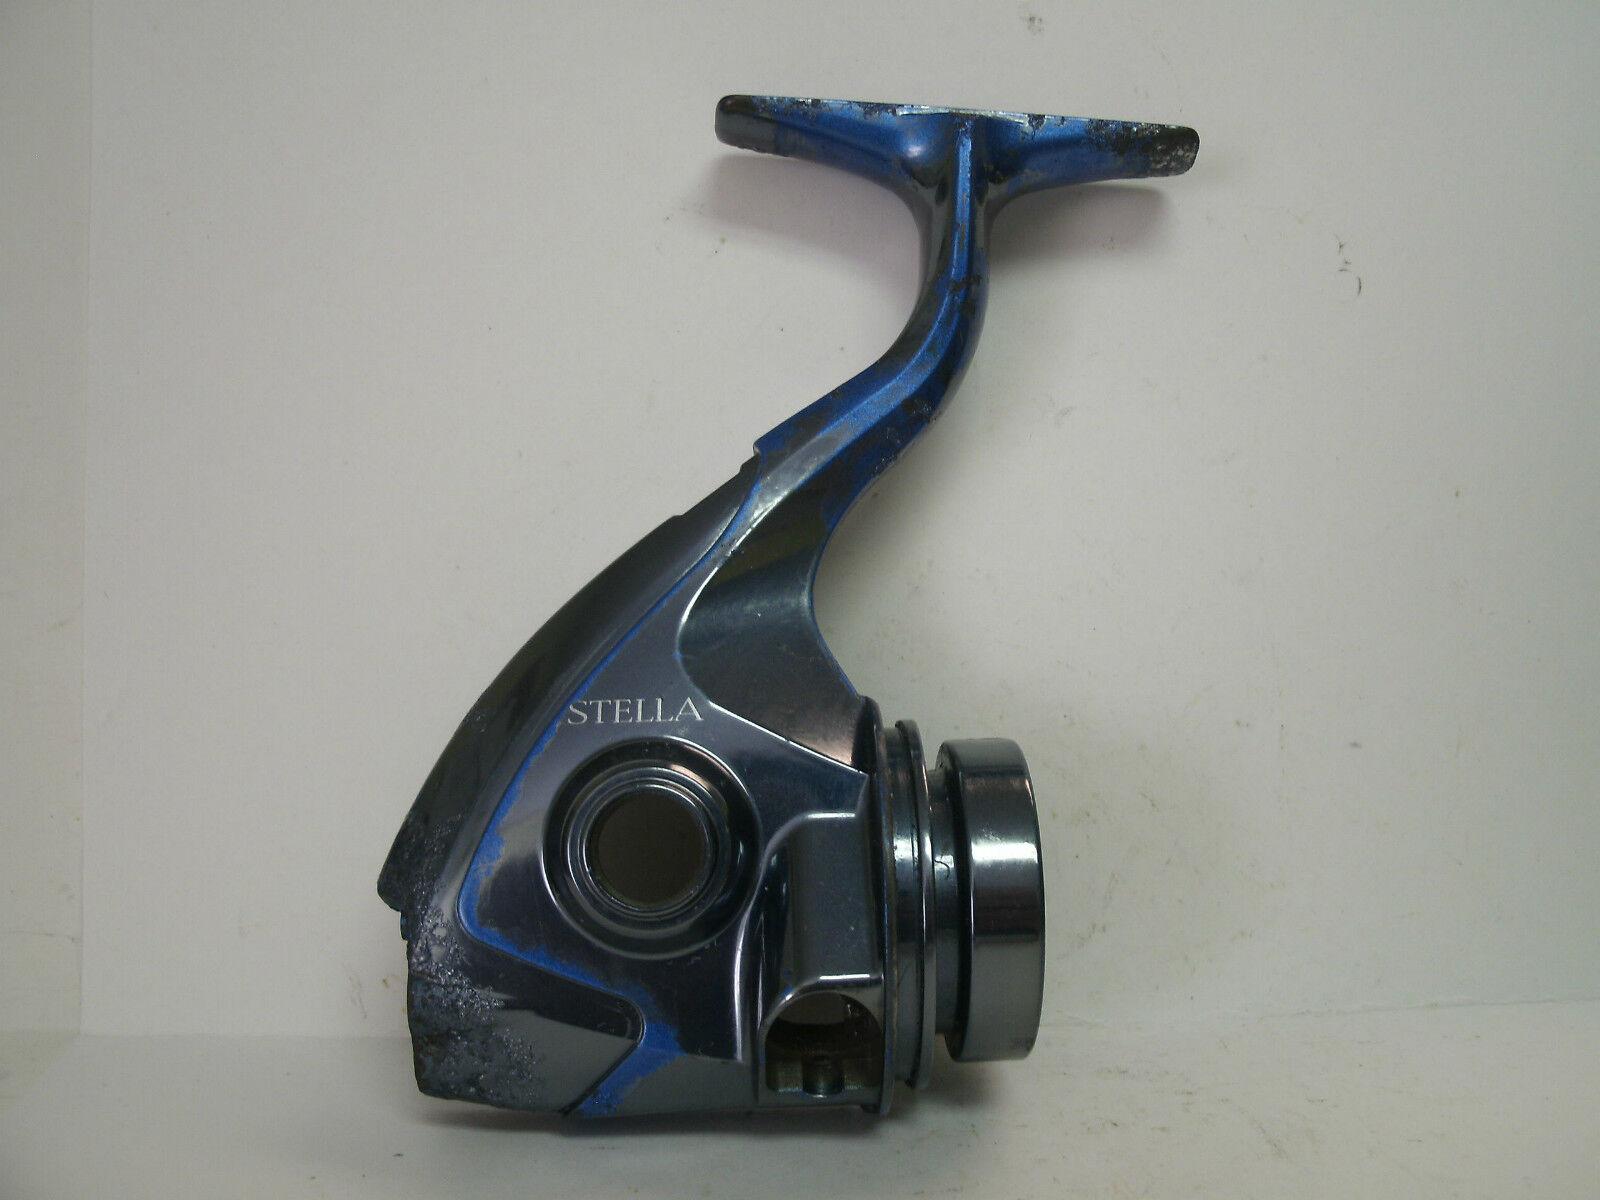 USED SHIuomoO REEL PART Stella 20000 FA Spinning Reel  corpo  Corrosion